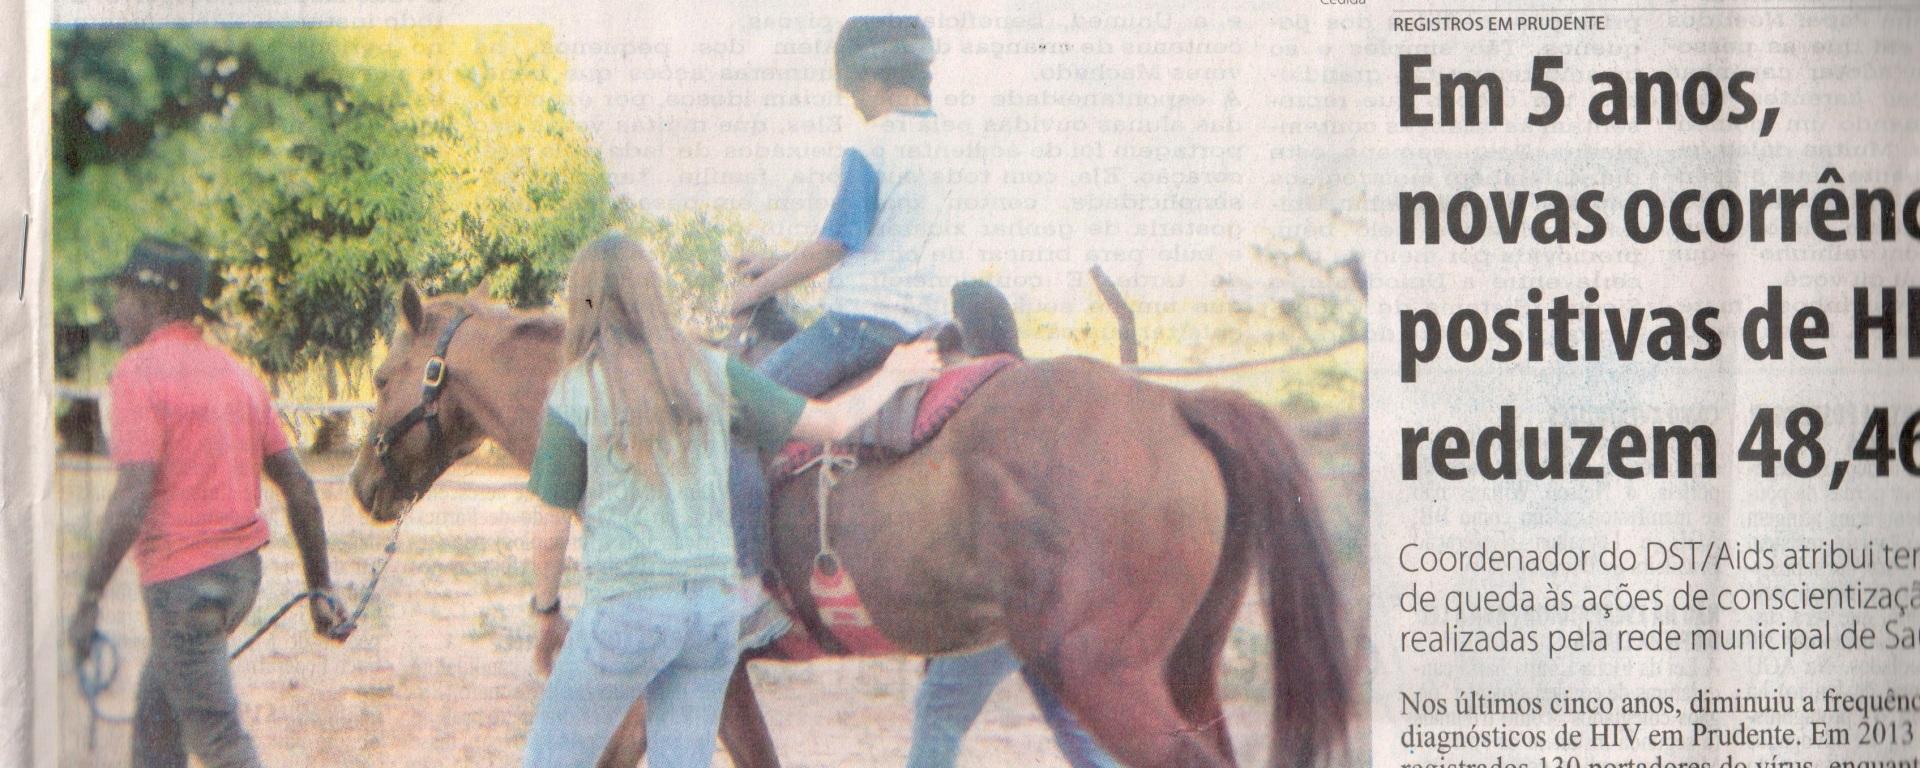 Jornal O Imparcial Silvana Capa